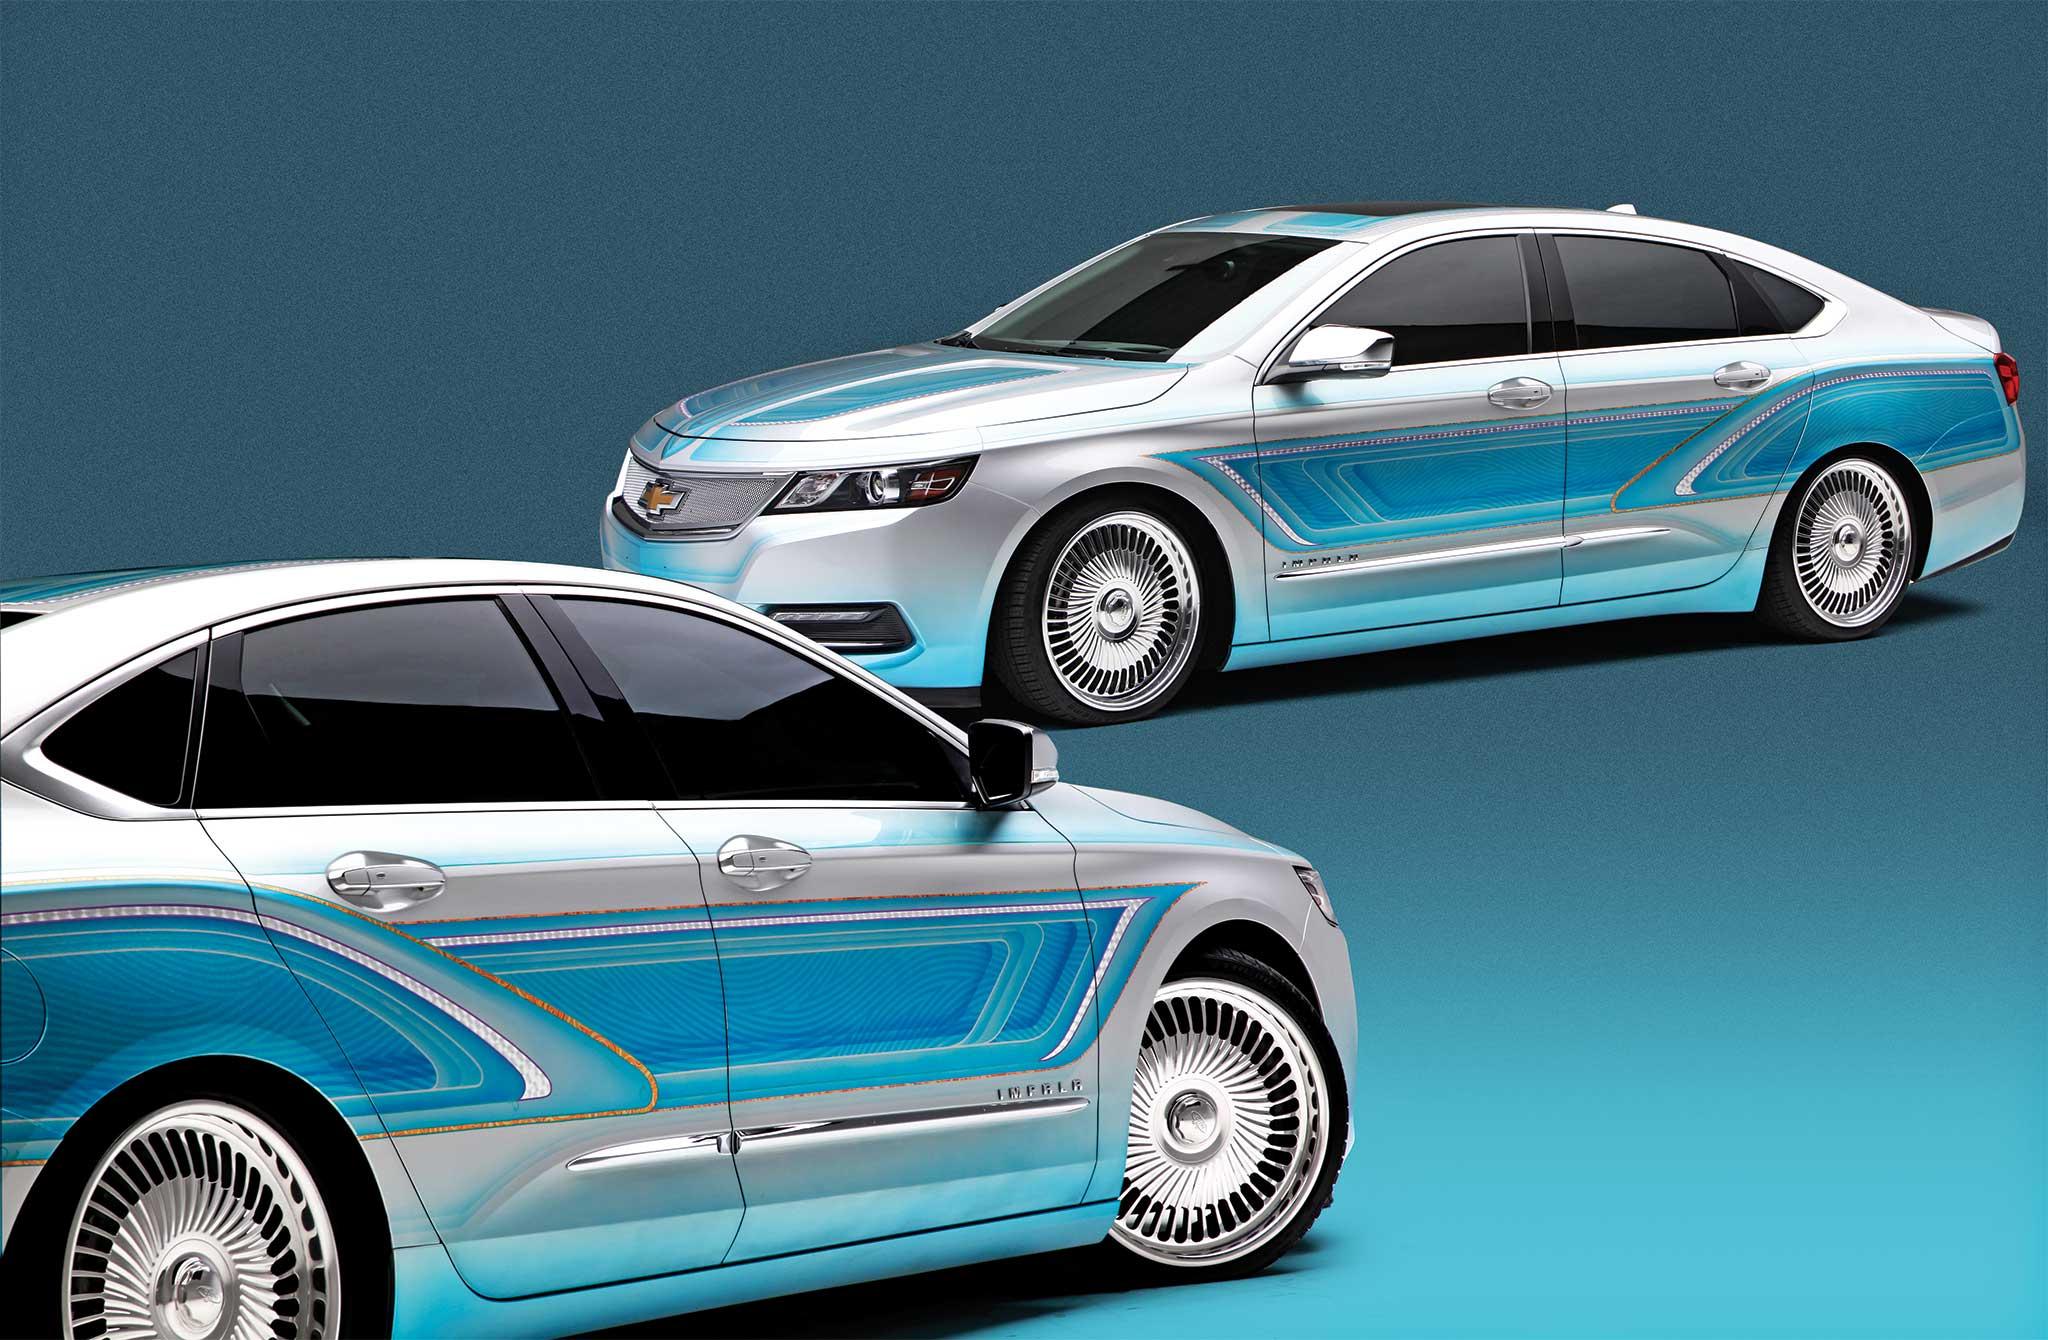 2014 chevrolet impala generation x lowrider. Black Bedroom Furniture Sets. Home Design Ideas